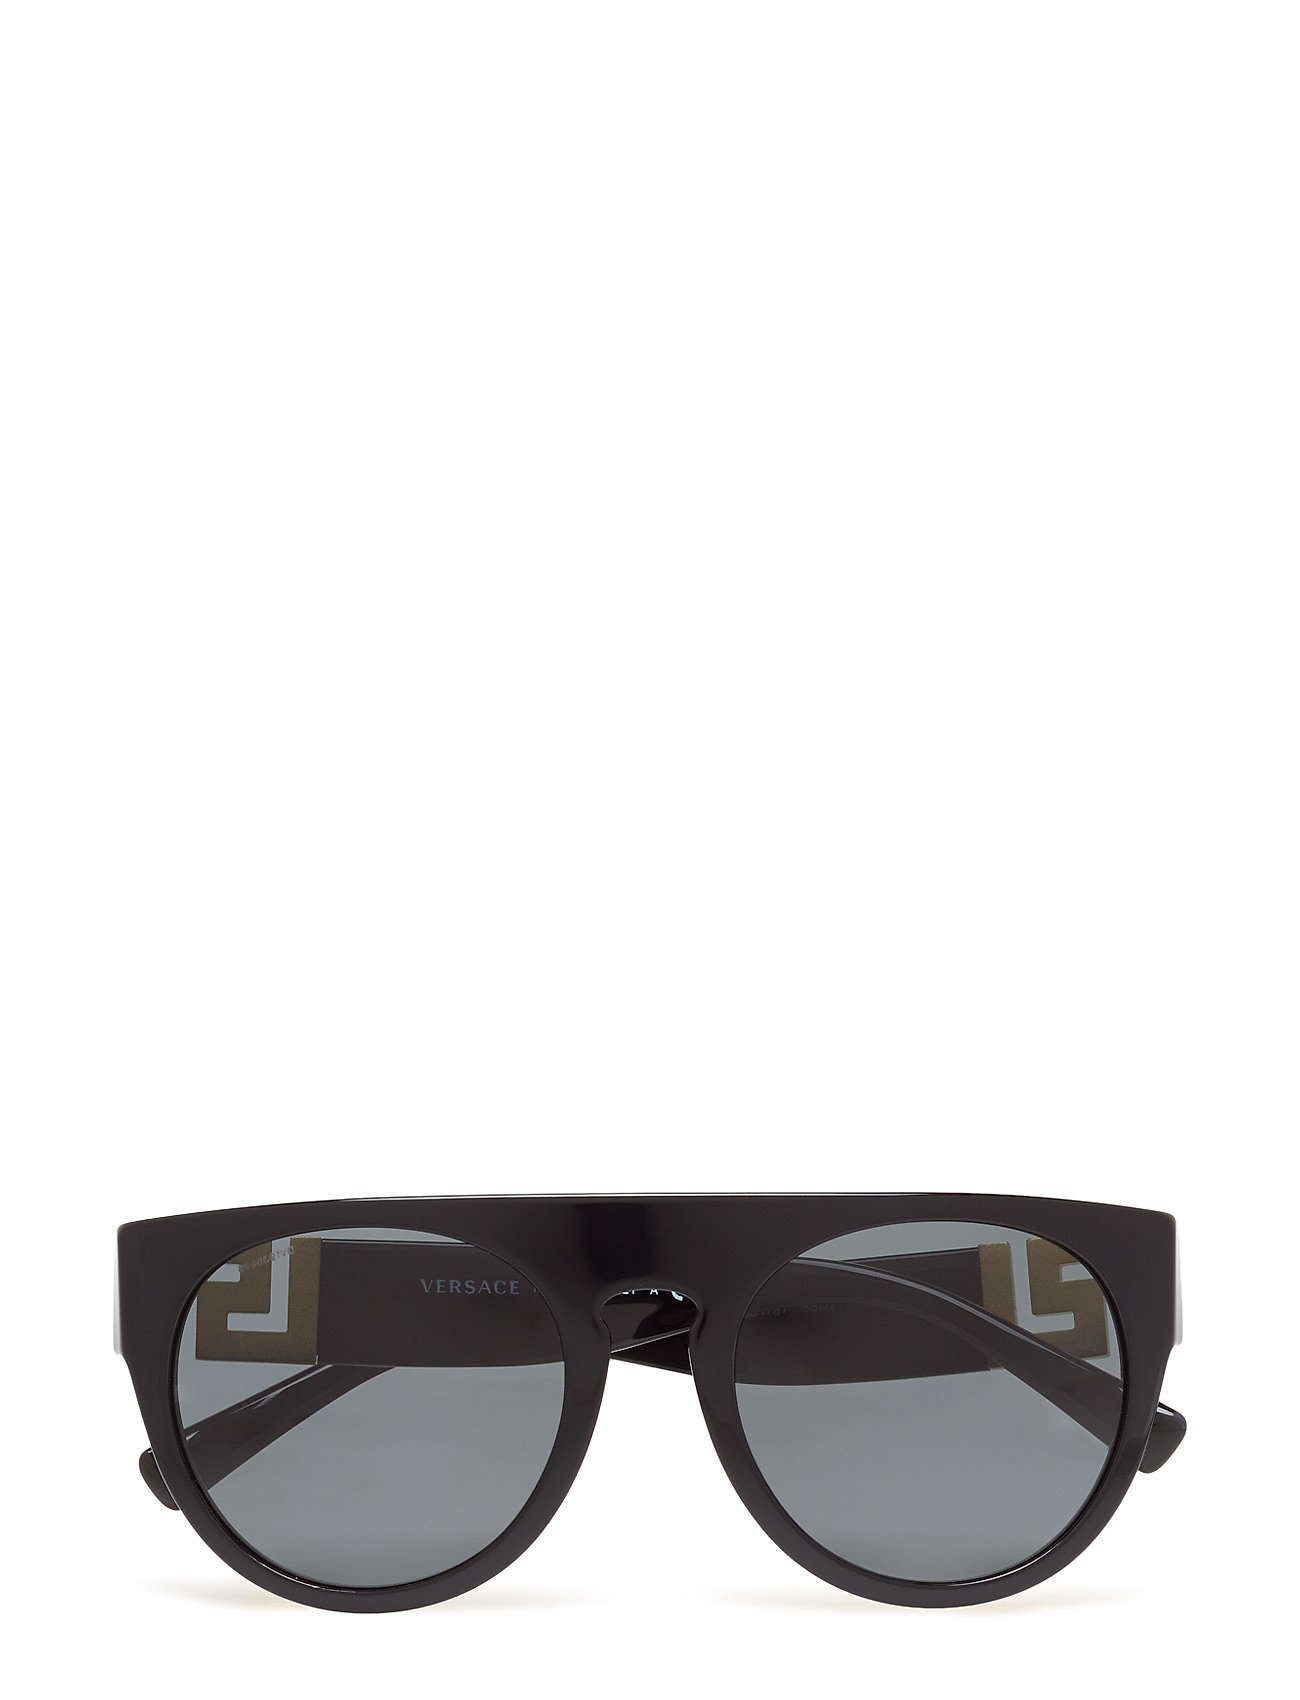 versace sunglasses – D-frame fra boozt.com dk